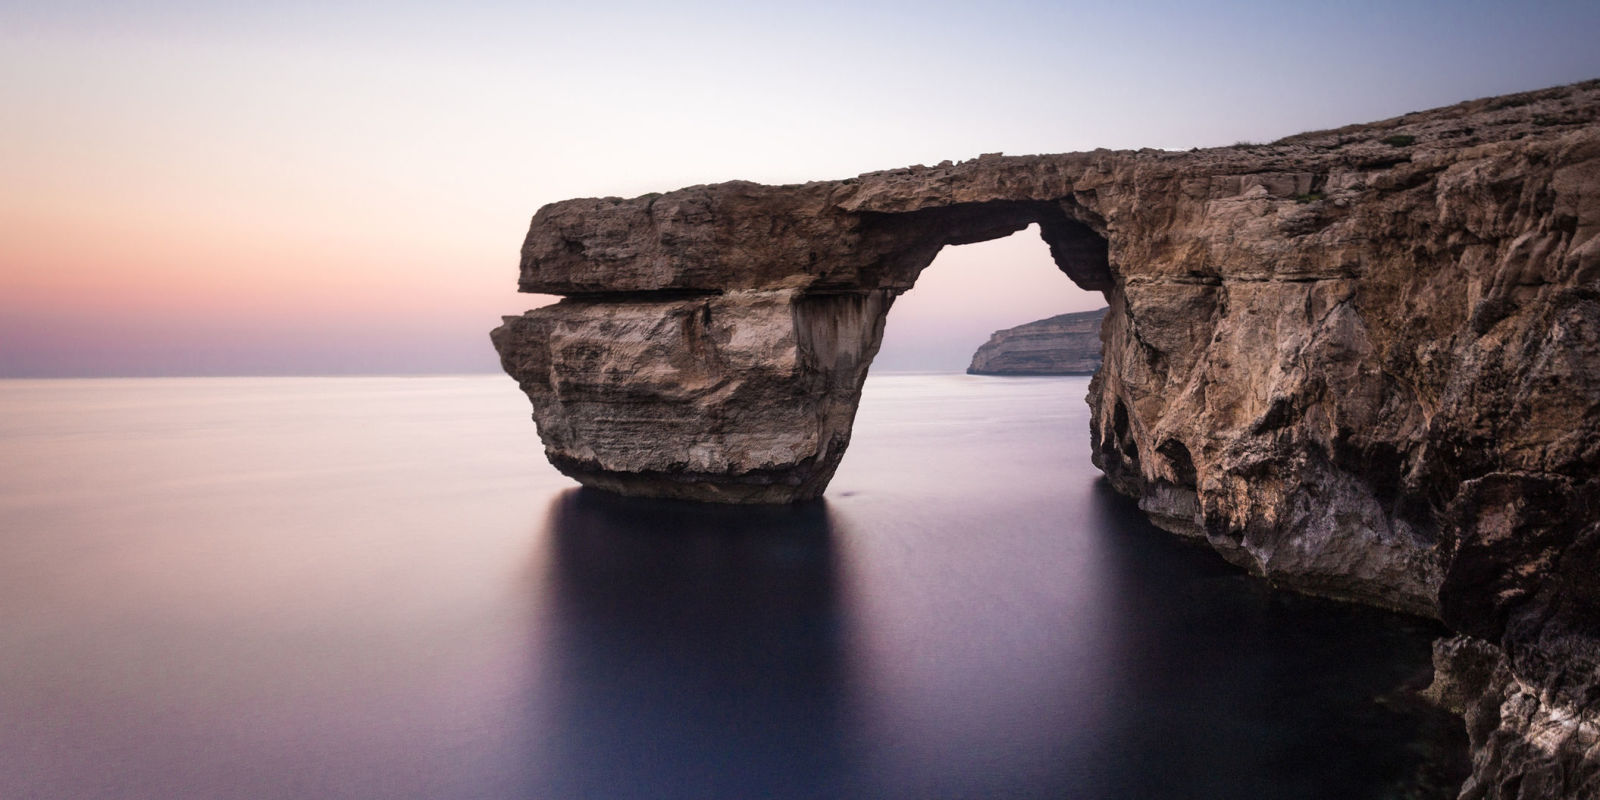 Malta S Azure Window Just Collapsed Into The Sea